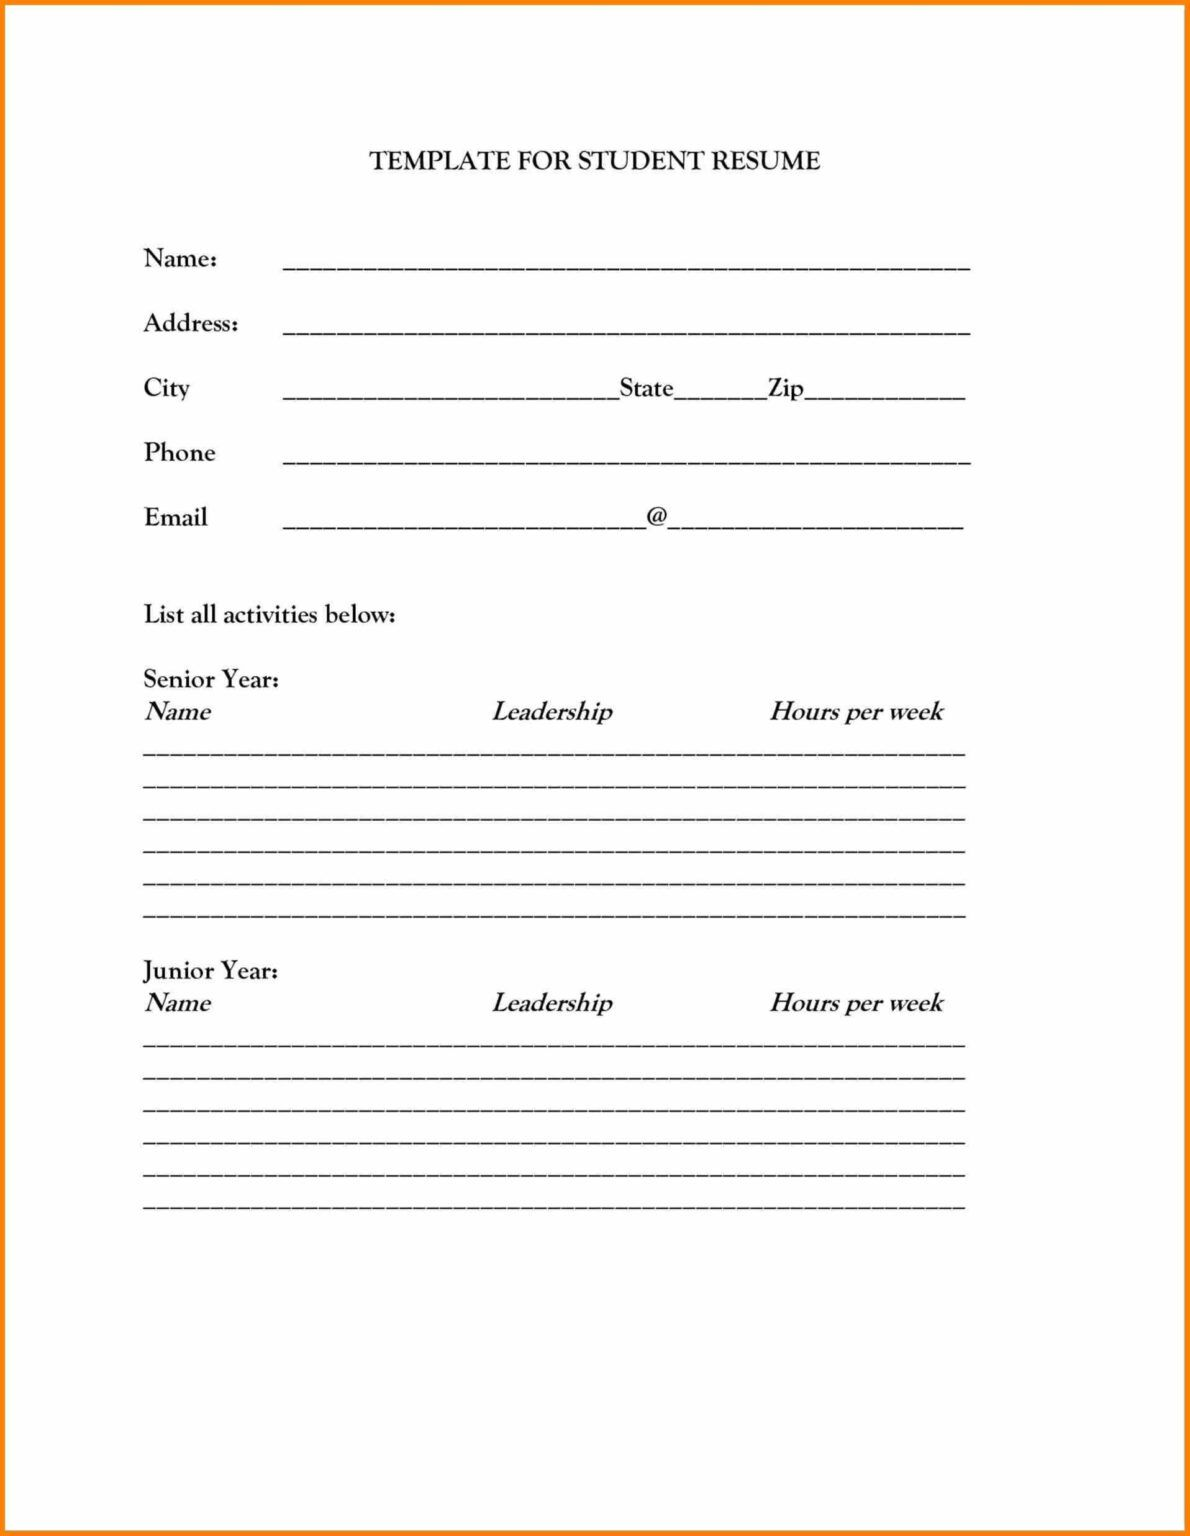 Blank resume templates baratiald2014 inside free blank